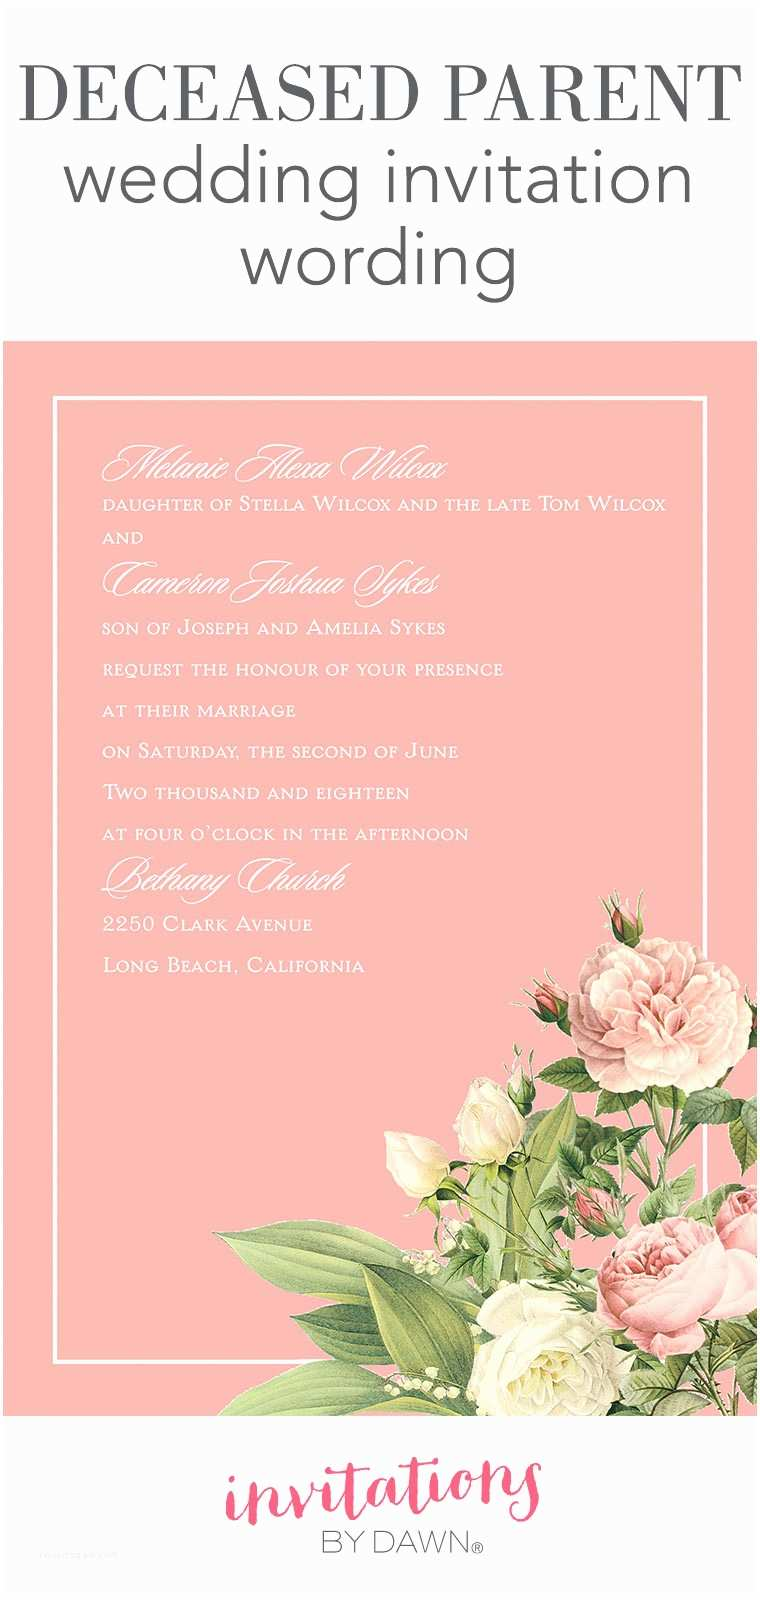 Wedding Invitation Announcement Wording Deceased Parent Wedding Invitation Wording